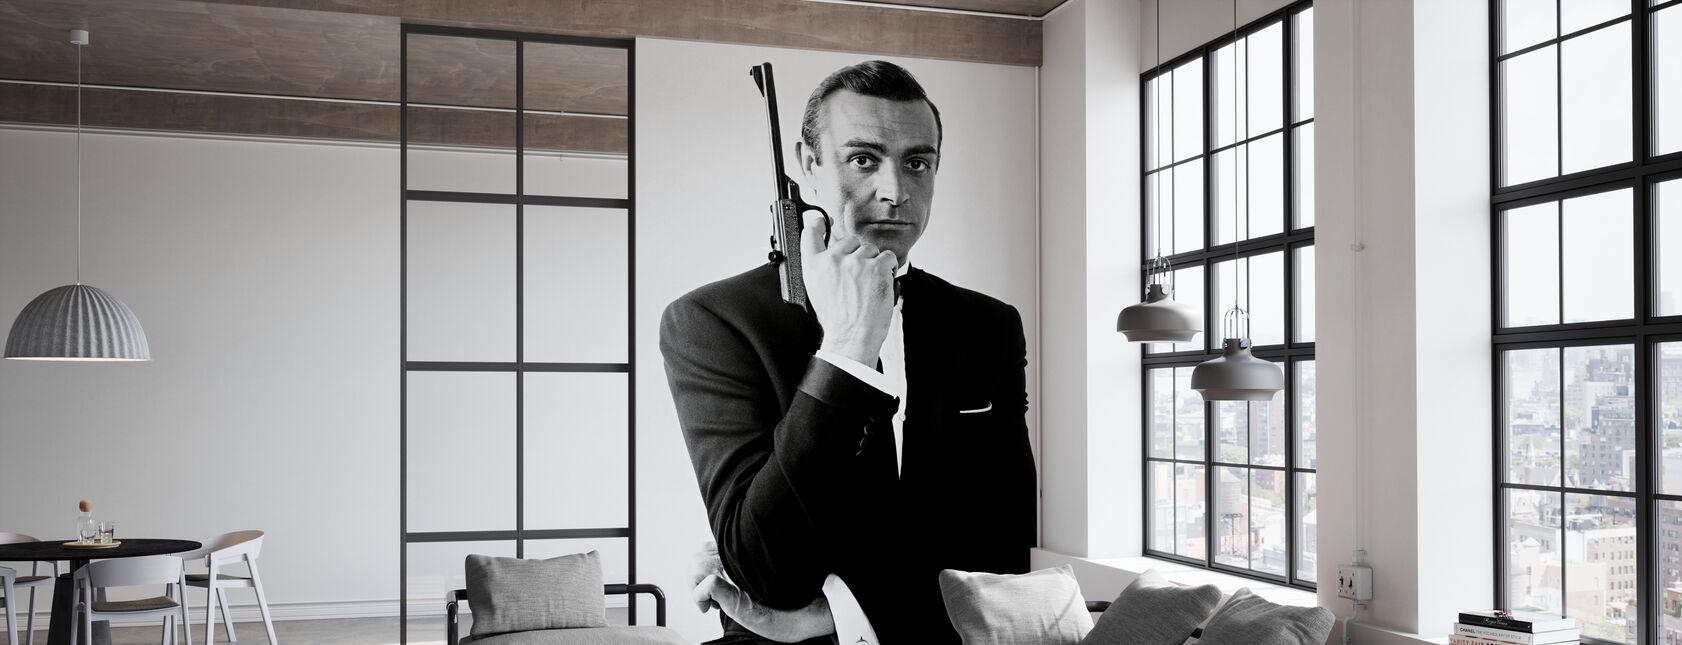 James Bond Dr Nein - Tapete - Büro